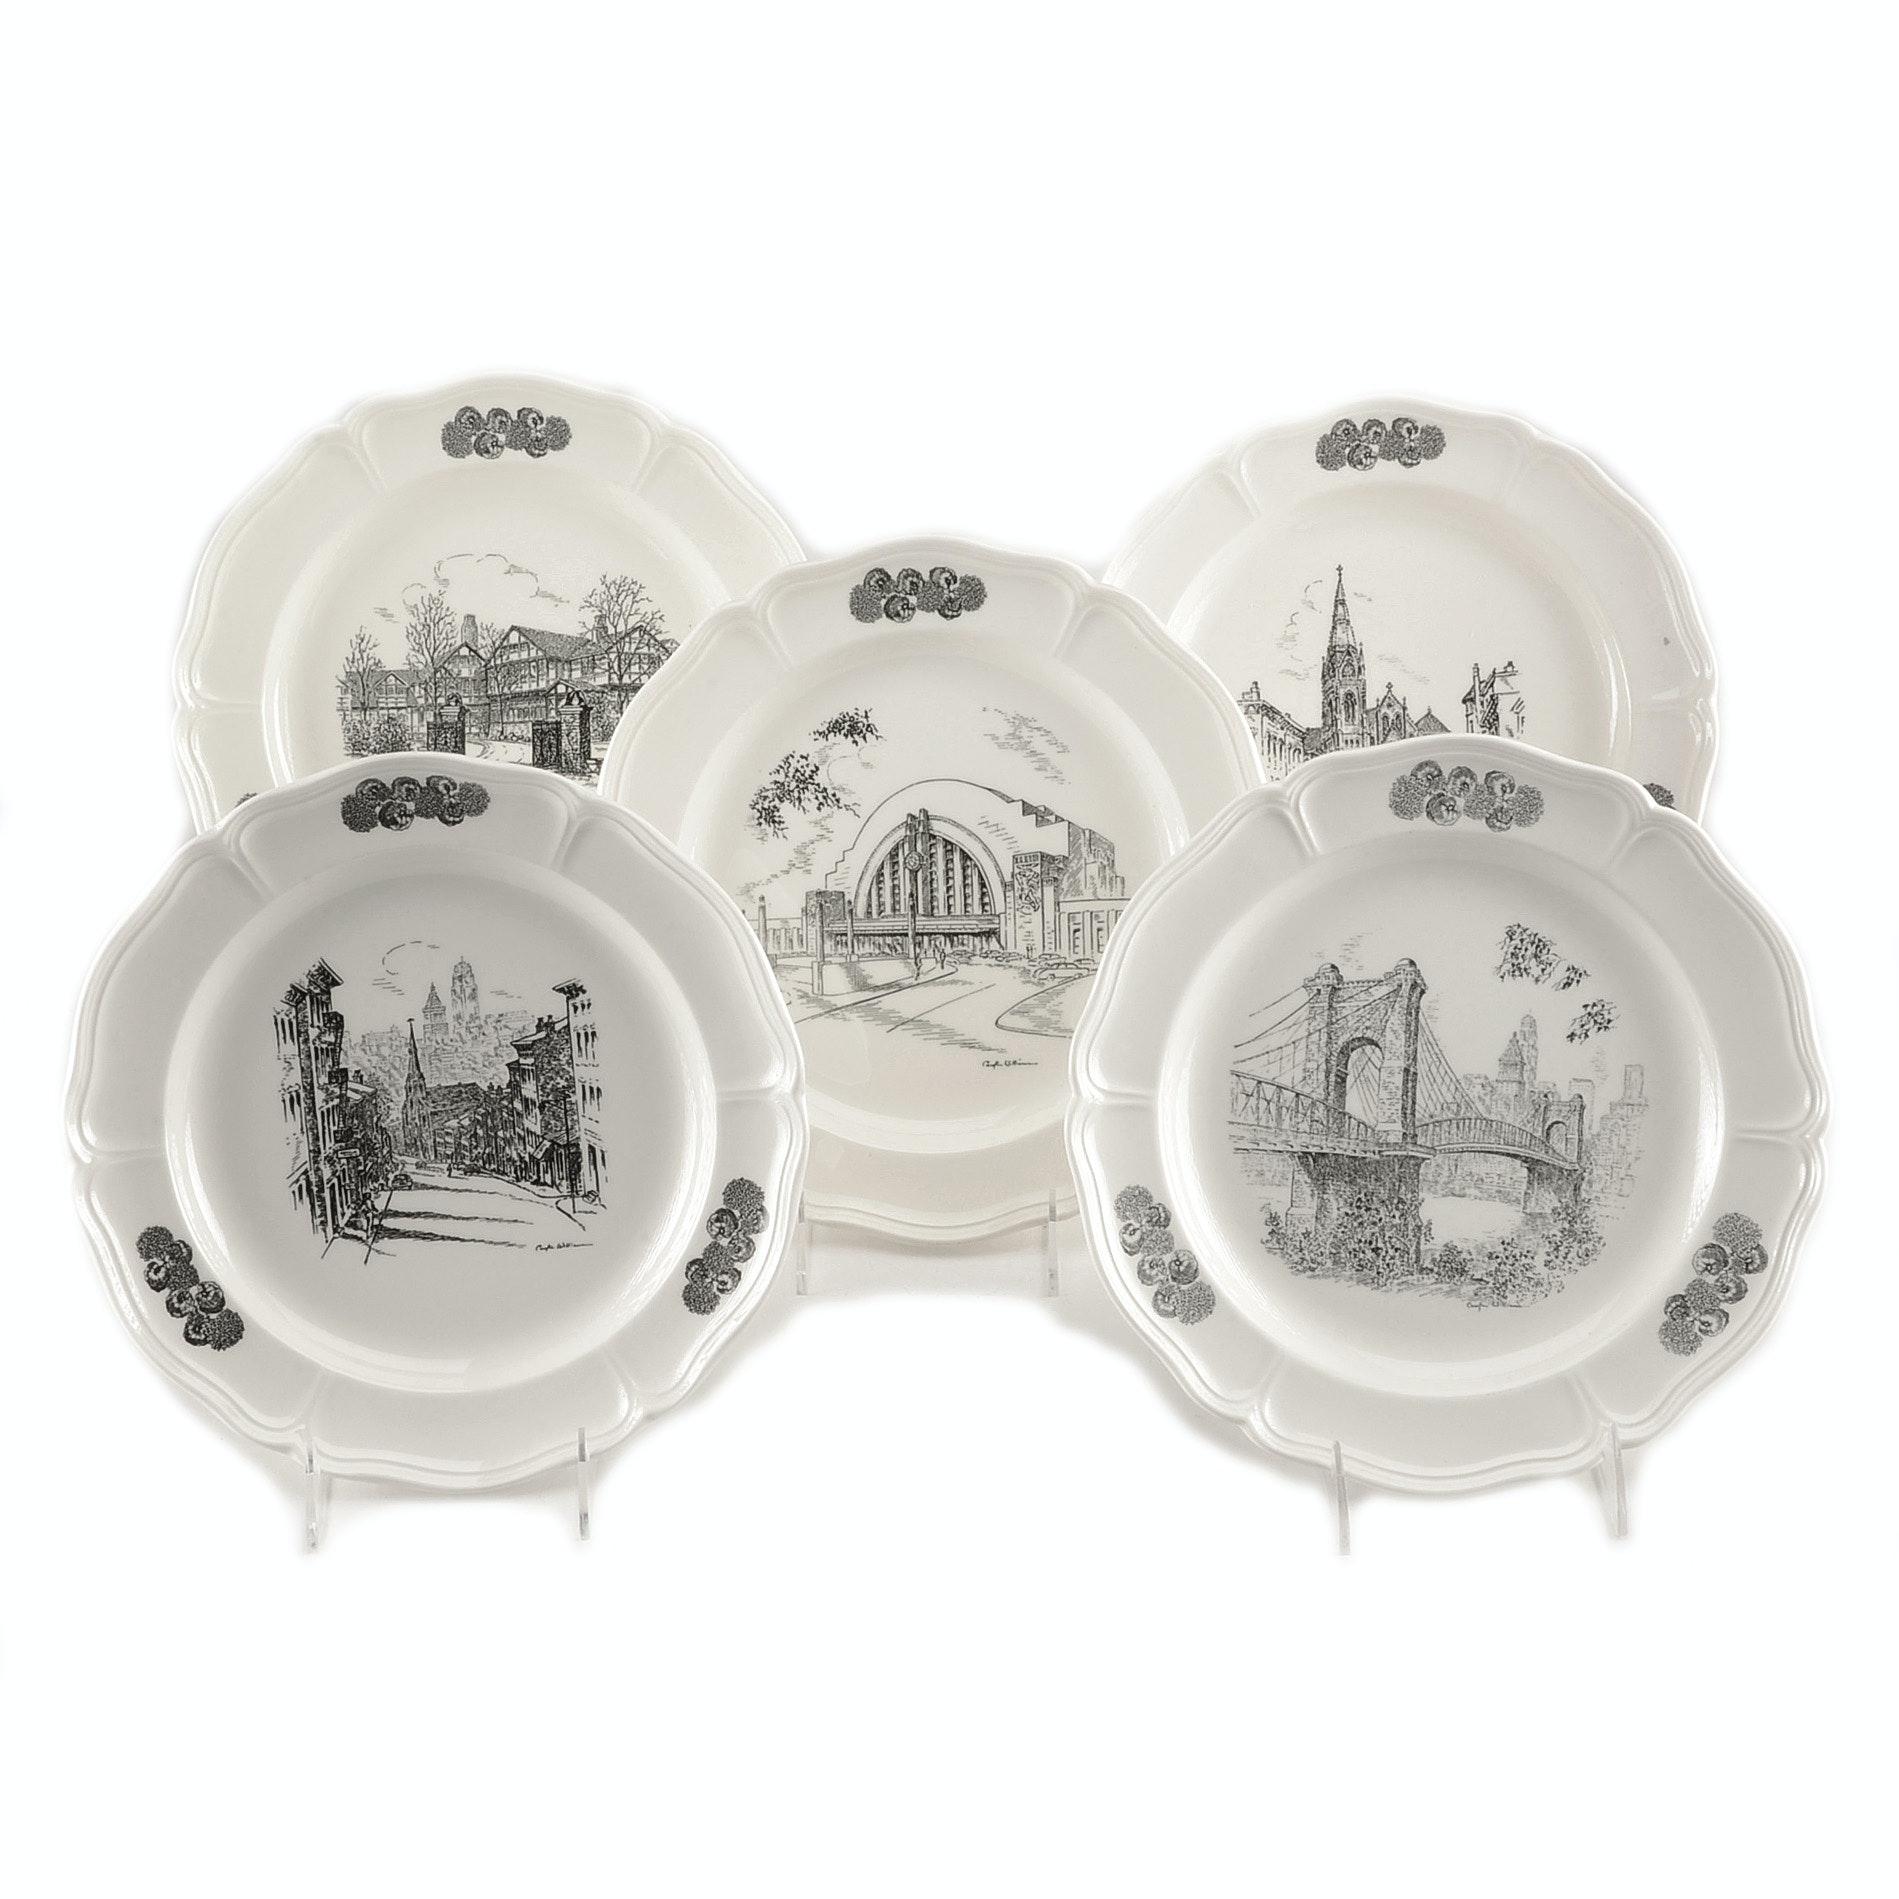 Group of Wedgwood Caroline Williams Cincinnati Collectible Plates